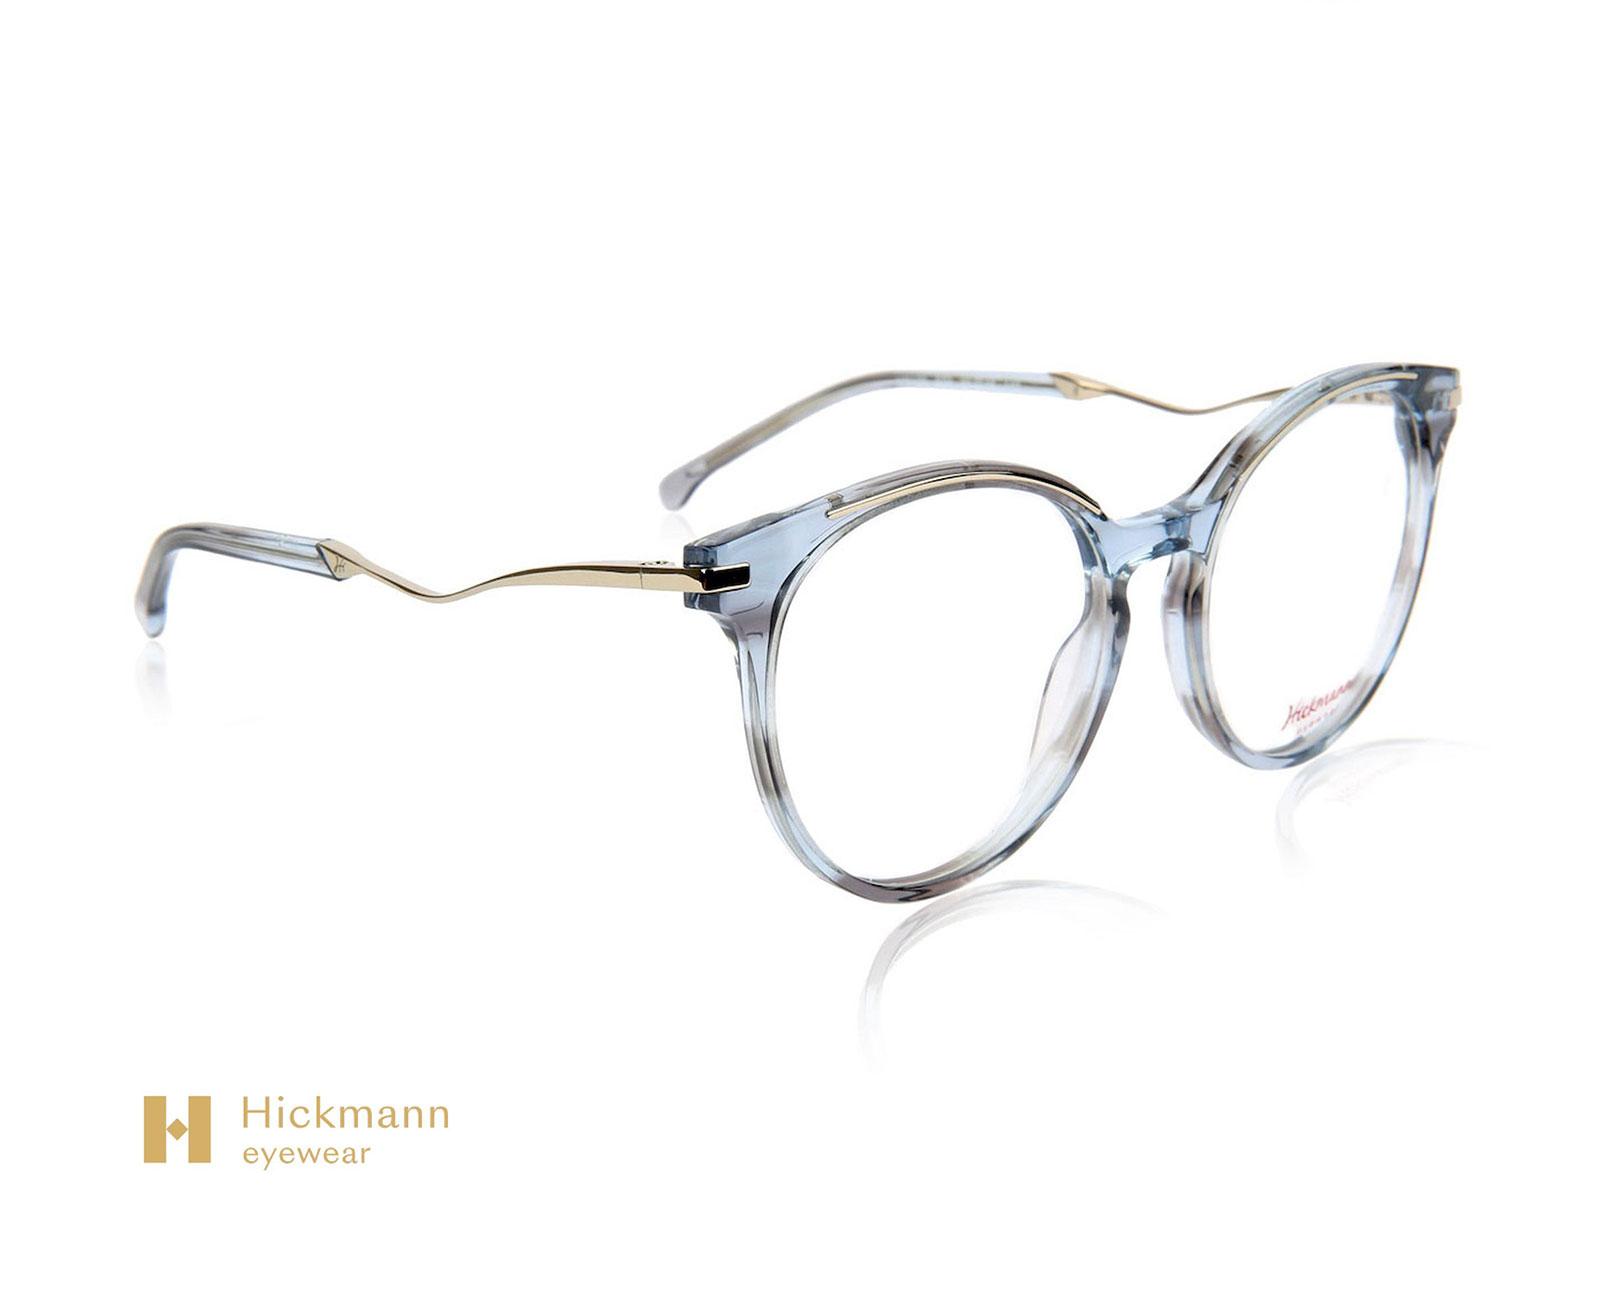 Hickmann Eyewear HI6139 in Grey Blue Stripe